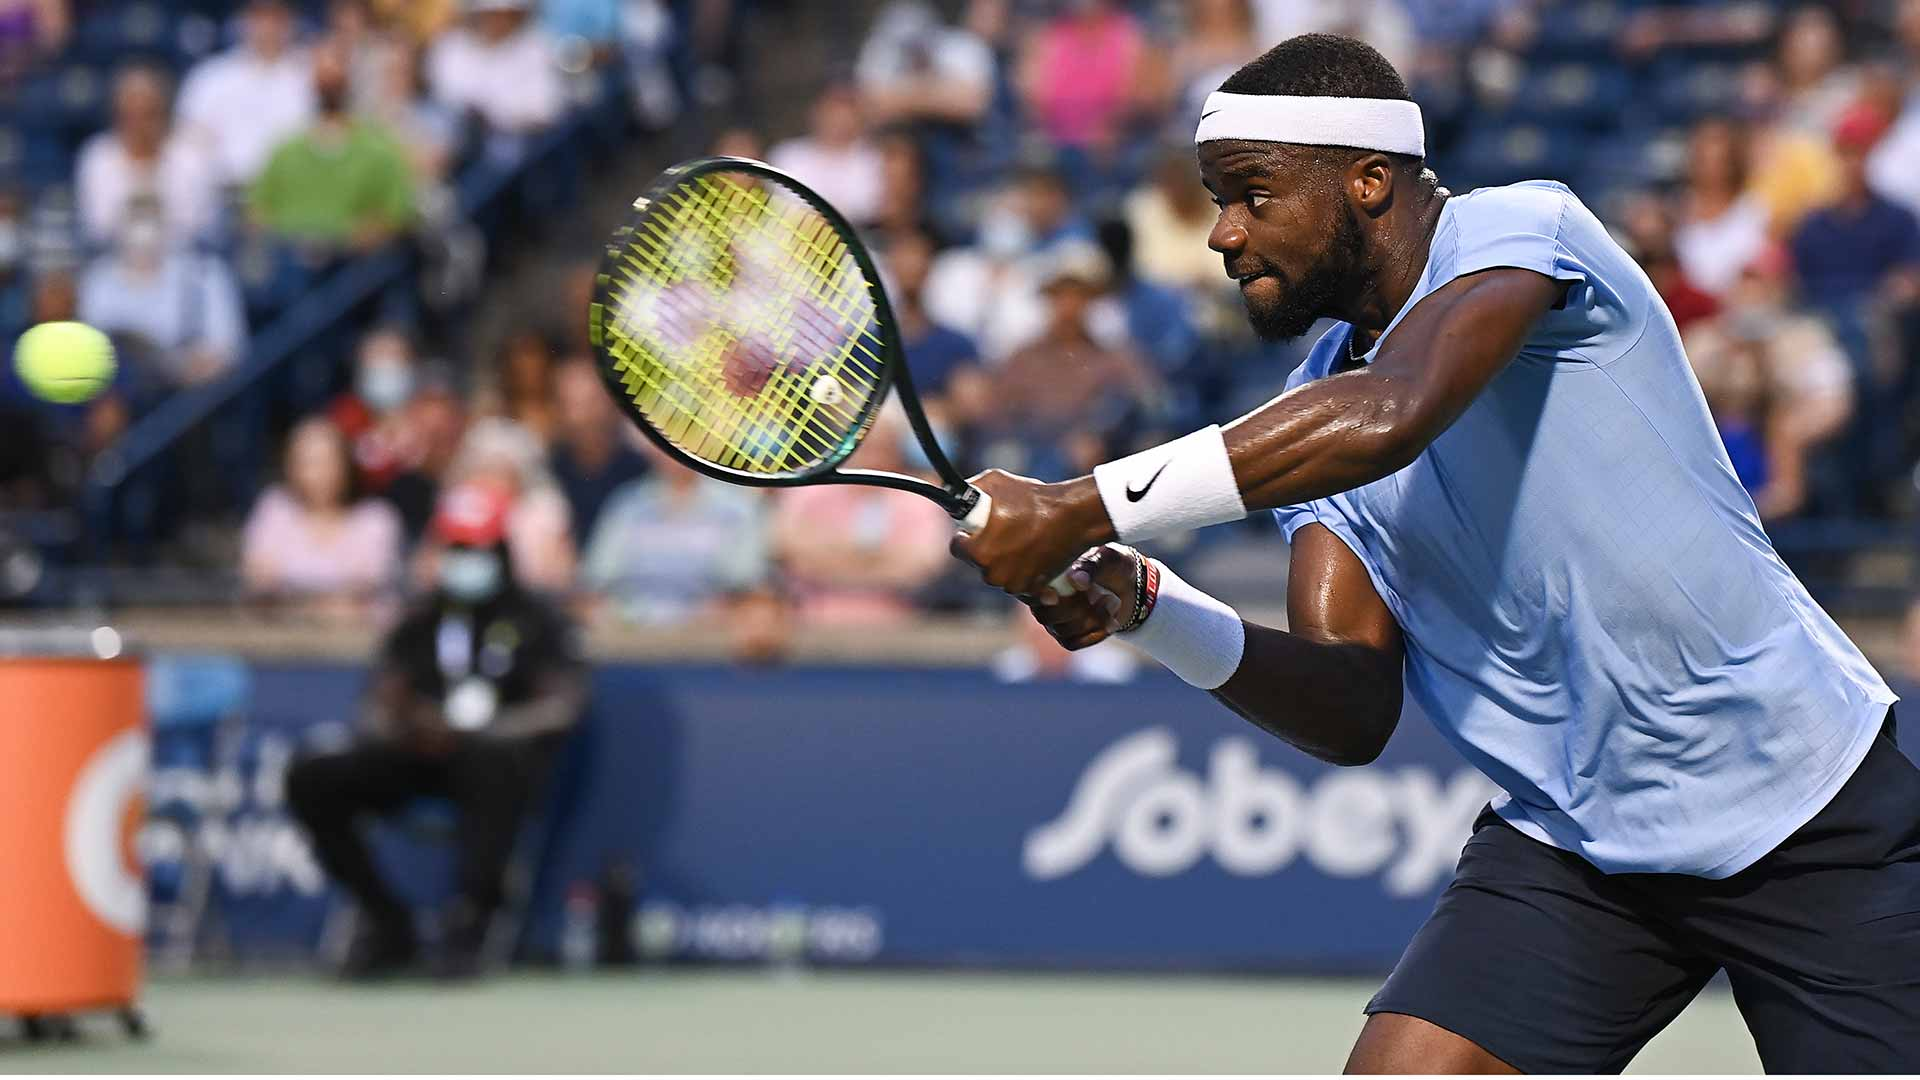 Toronto Open 2021: Gael Monfils vs Frances Tiafoe Tennis Pick and Prediction